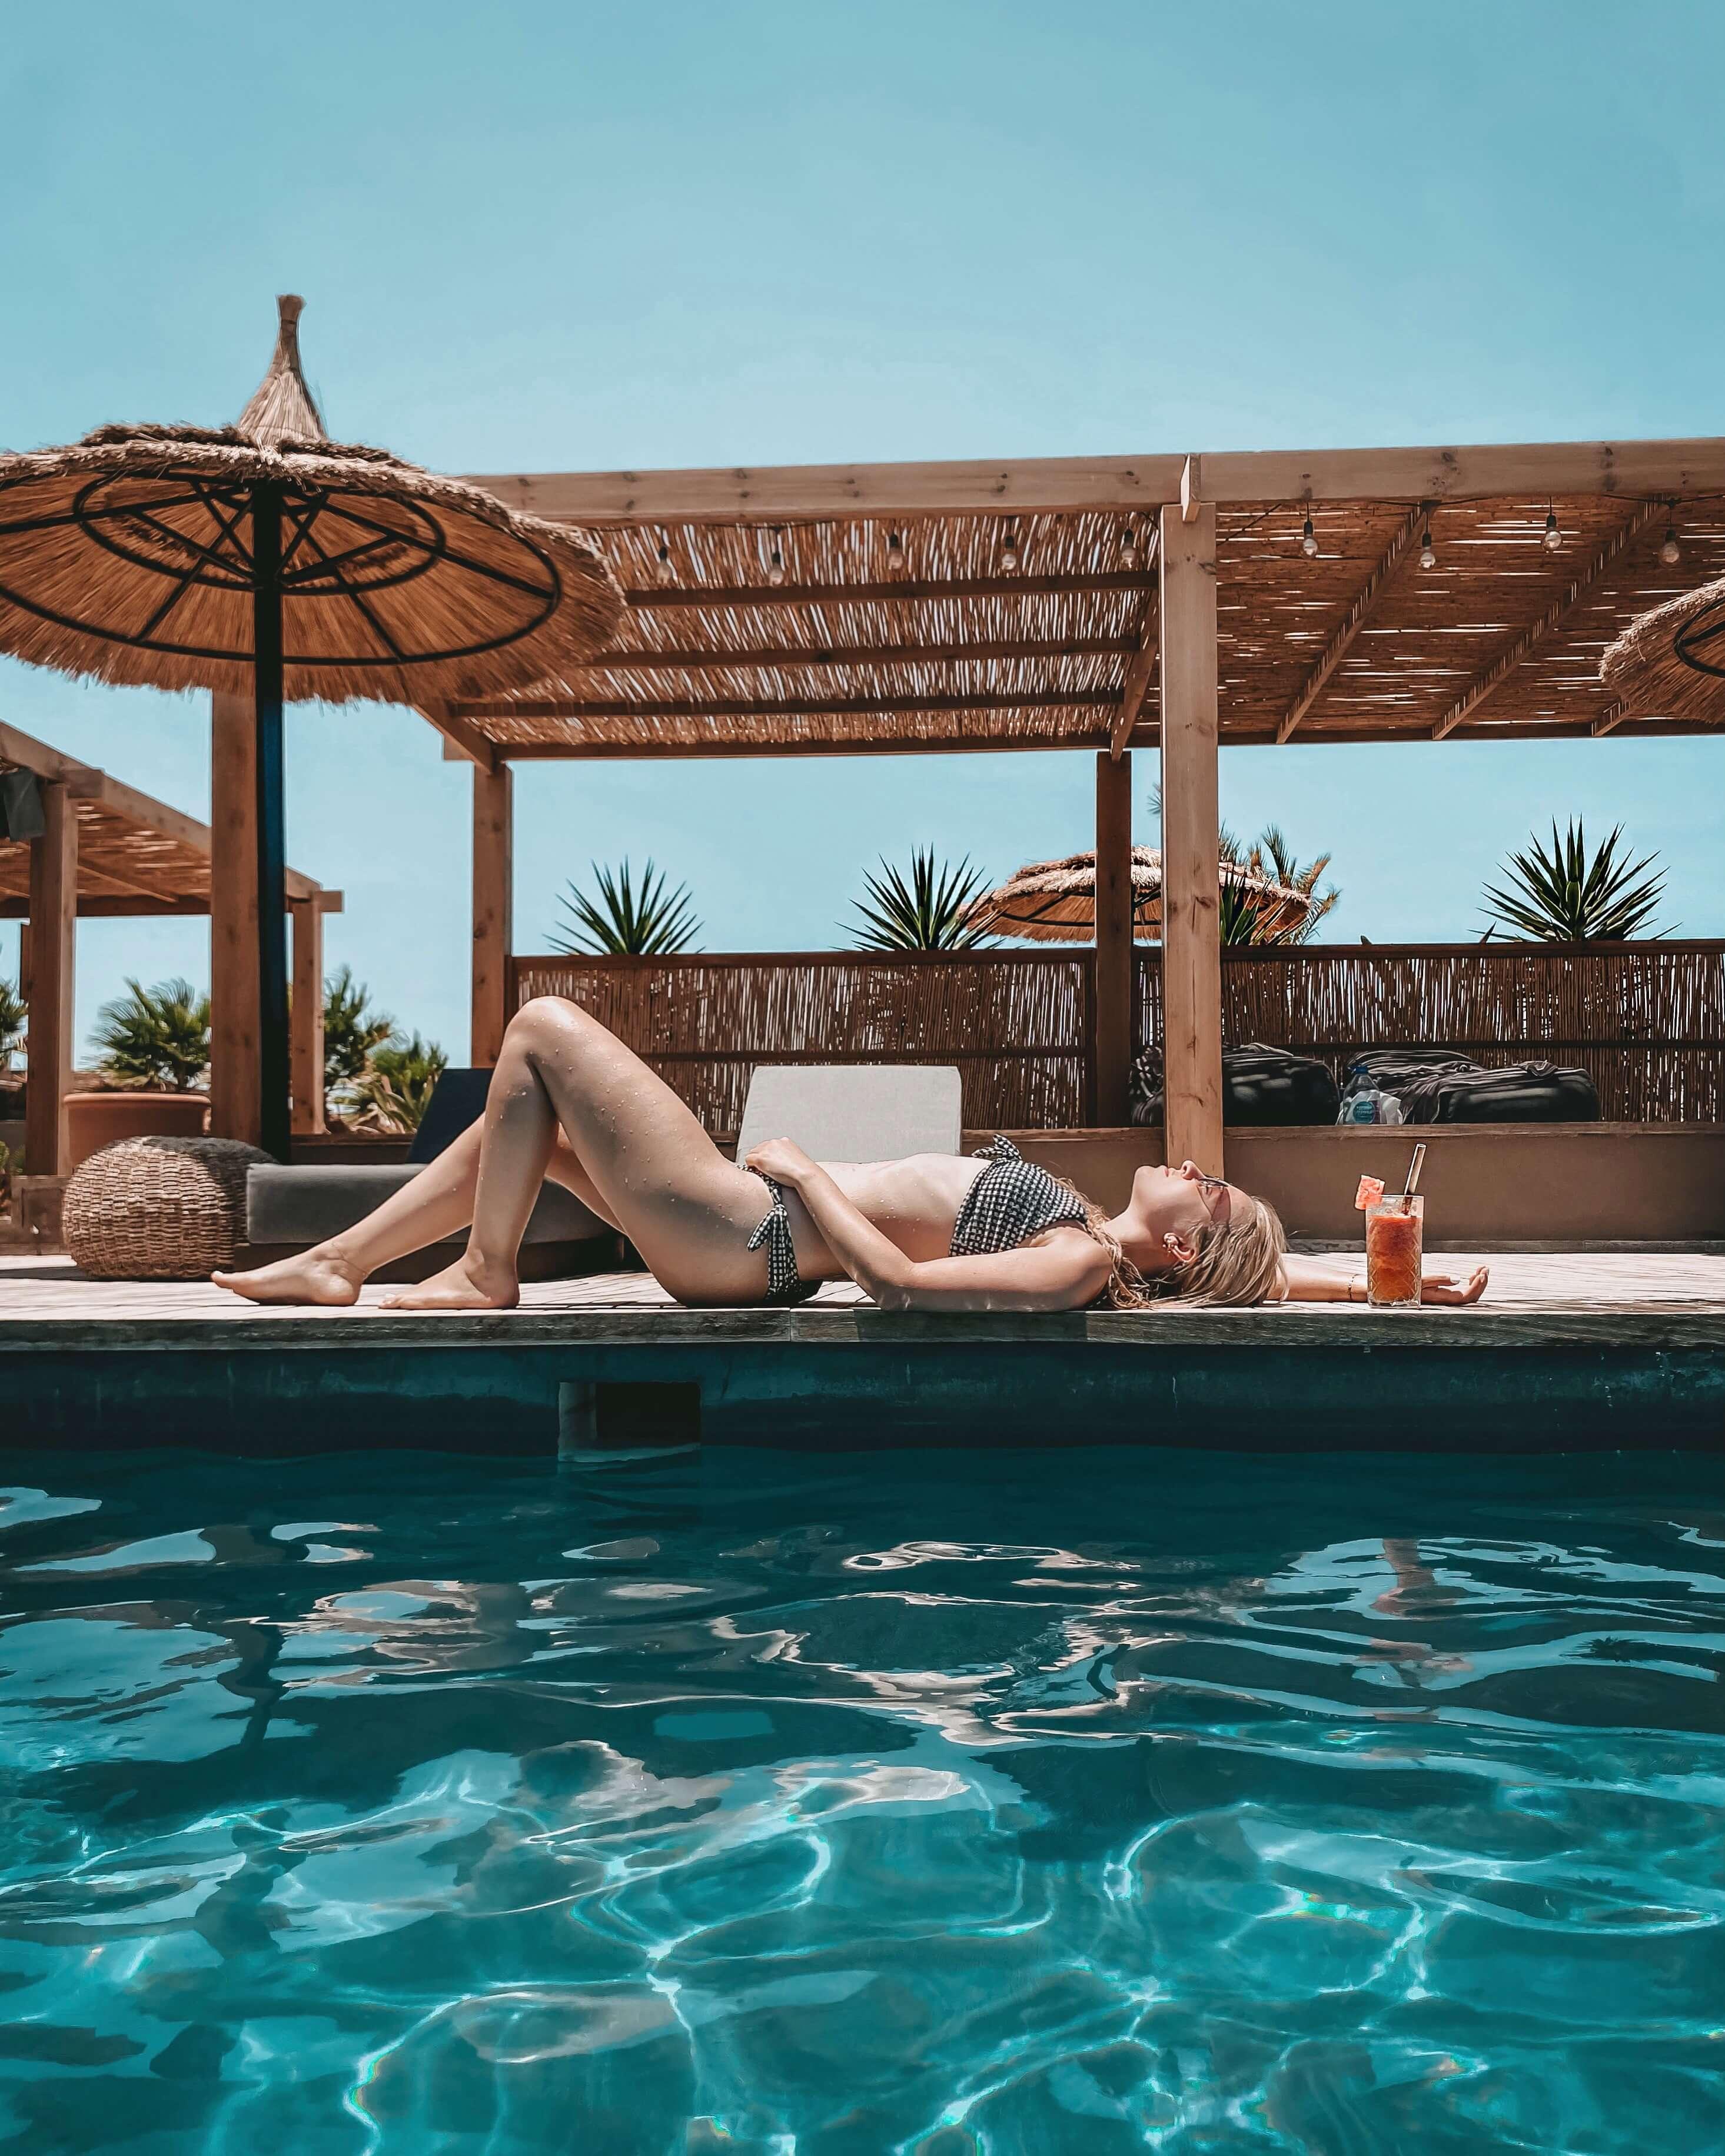 El Gouna, Egypt, Ägypten, Katefully, Reisebericht, Modeblog München, Reiseblog, Urlaub in Ägypten, Reisetipps, Rotes Meer